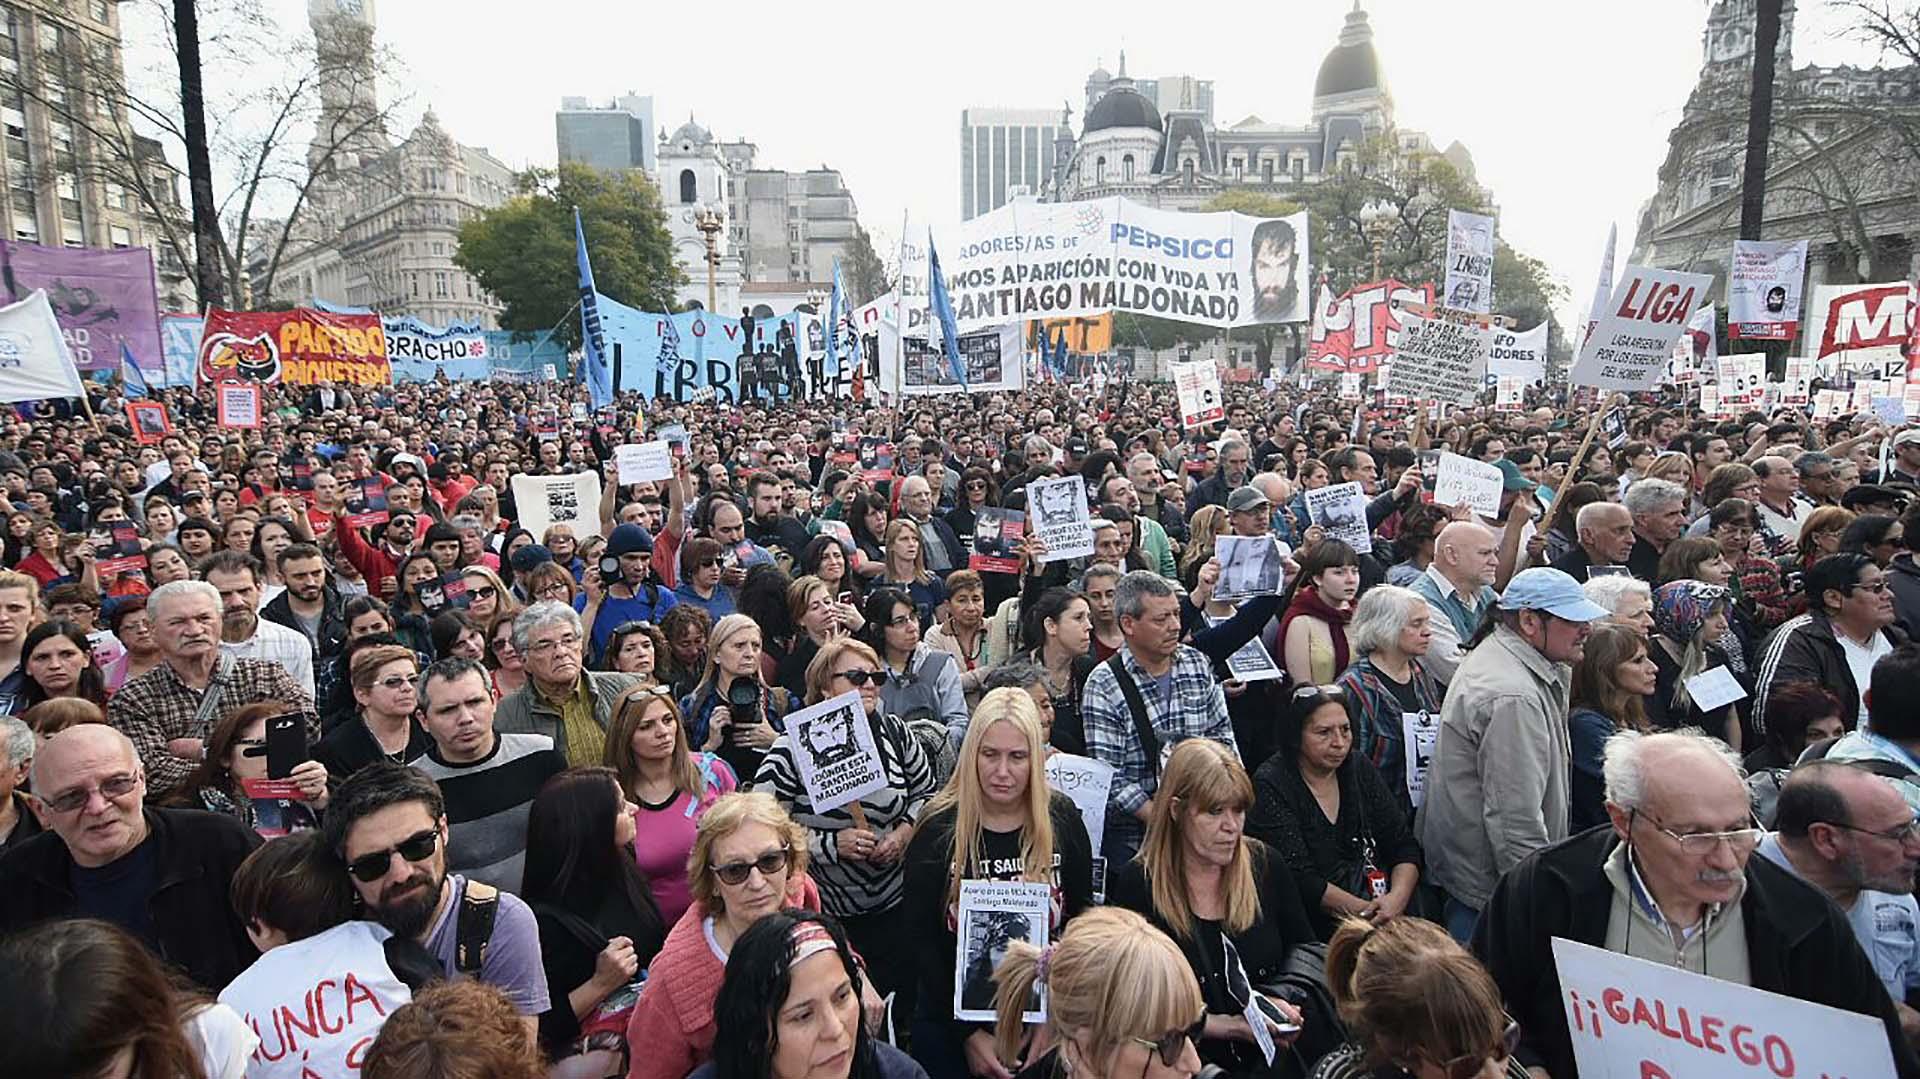 Los manifestantes en Plaza de Mayo (Nicolás Stulberg)